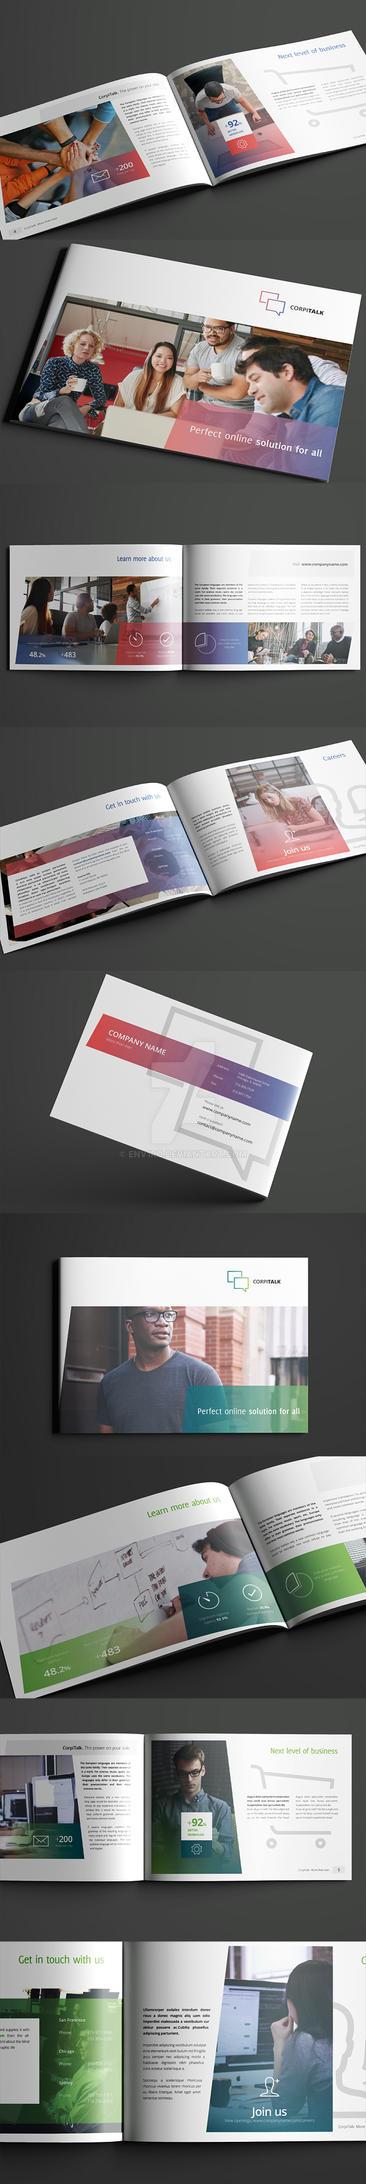 Business, Corporate Multi-purpose A4 Brochure 5 by env1ro